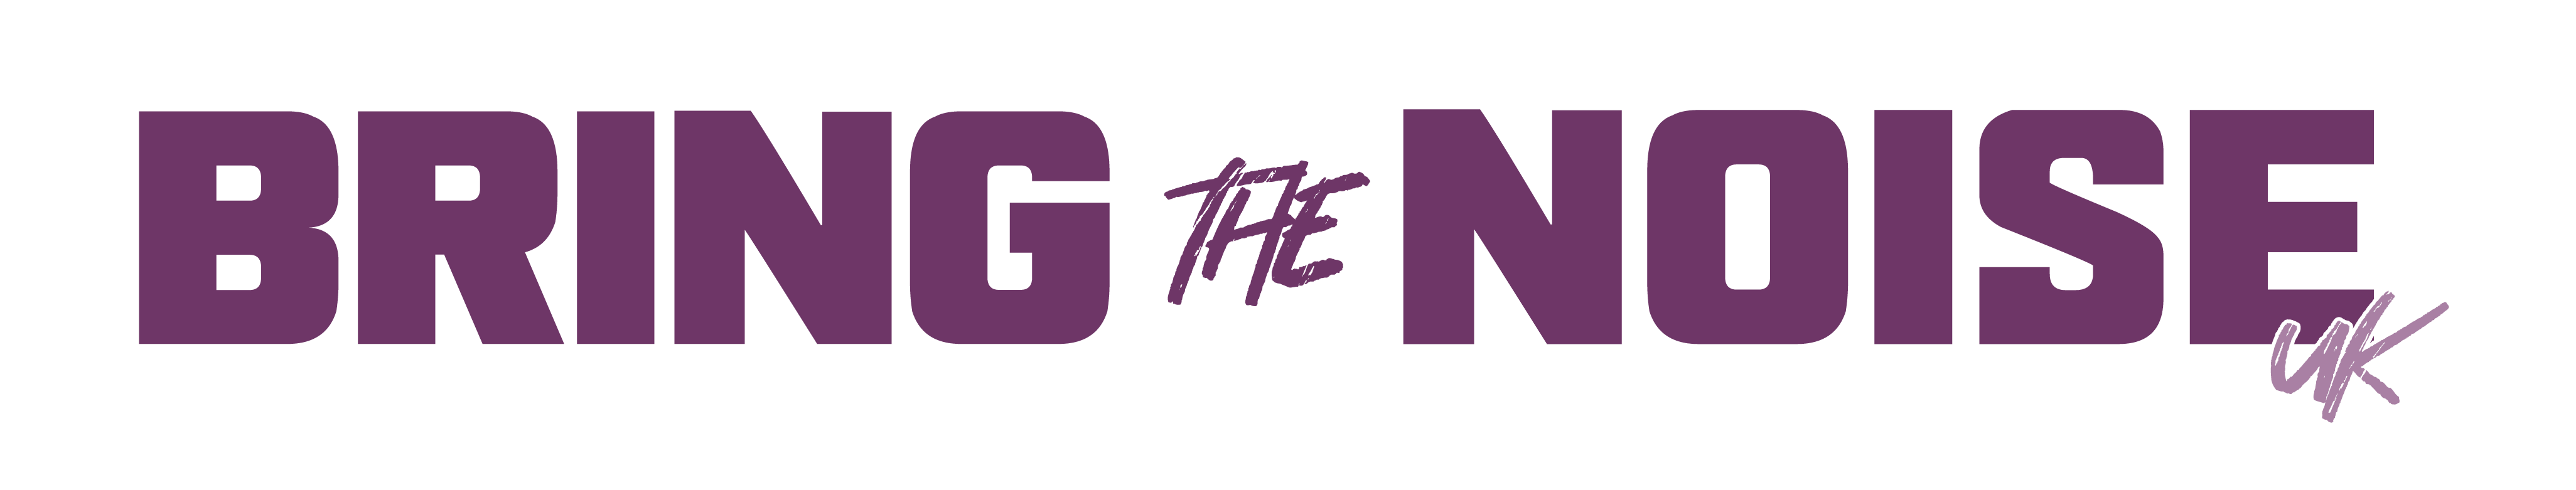 Bring the Noise UK